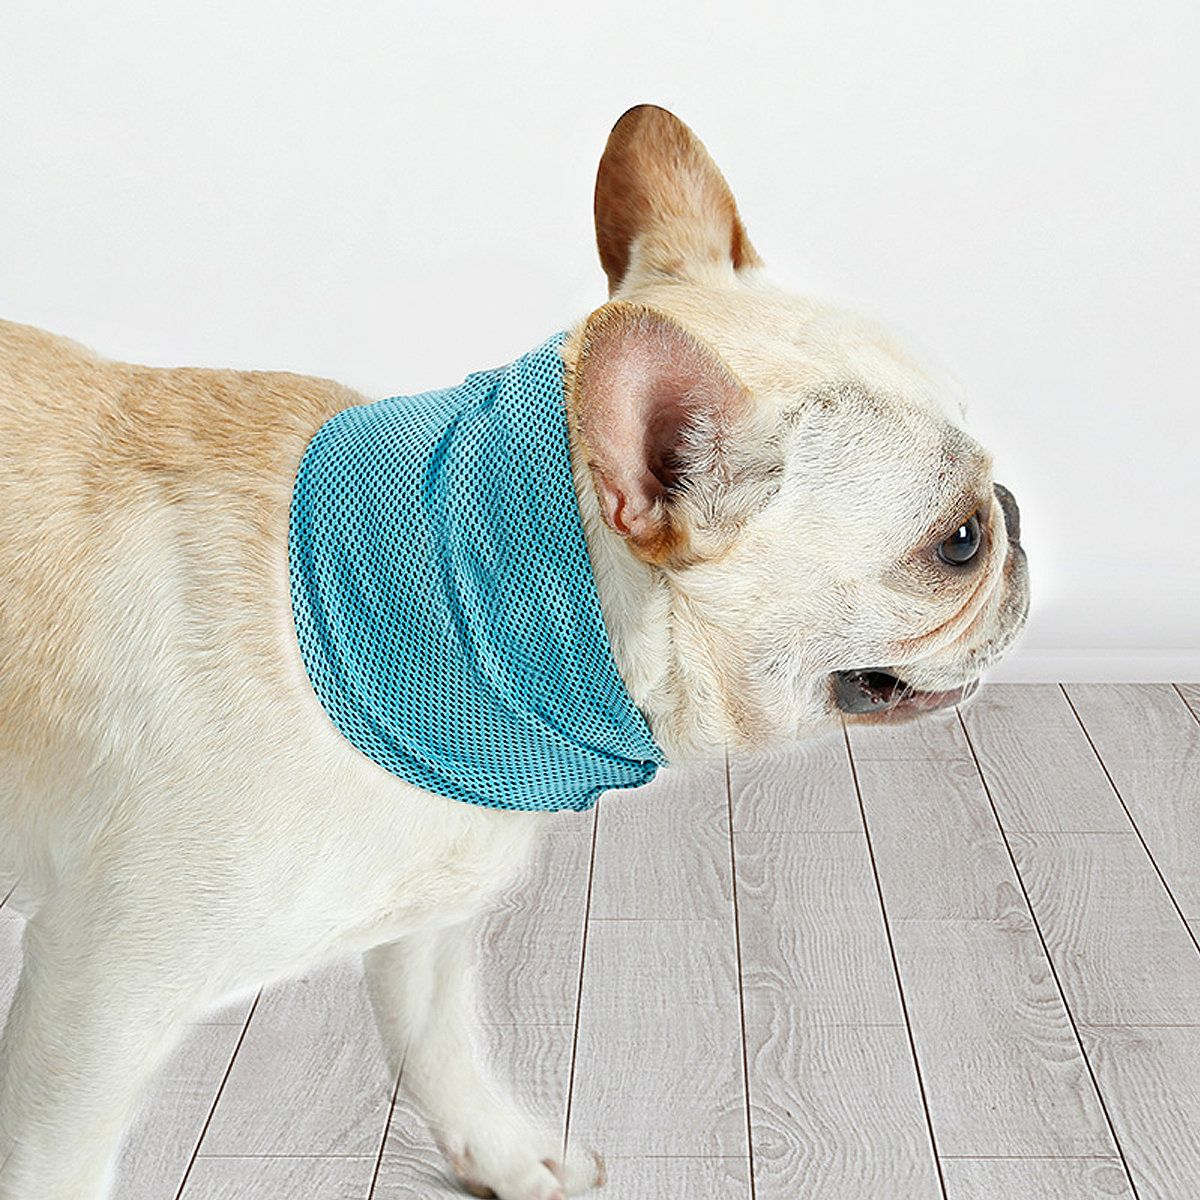 Pet Dog Ice Scarf Summer Ice Collar Ice Bandana for Pet Dogs SML Size